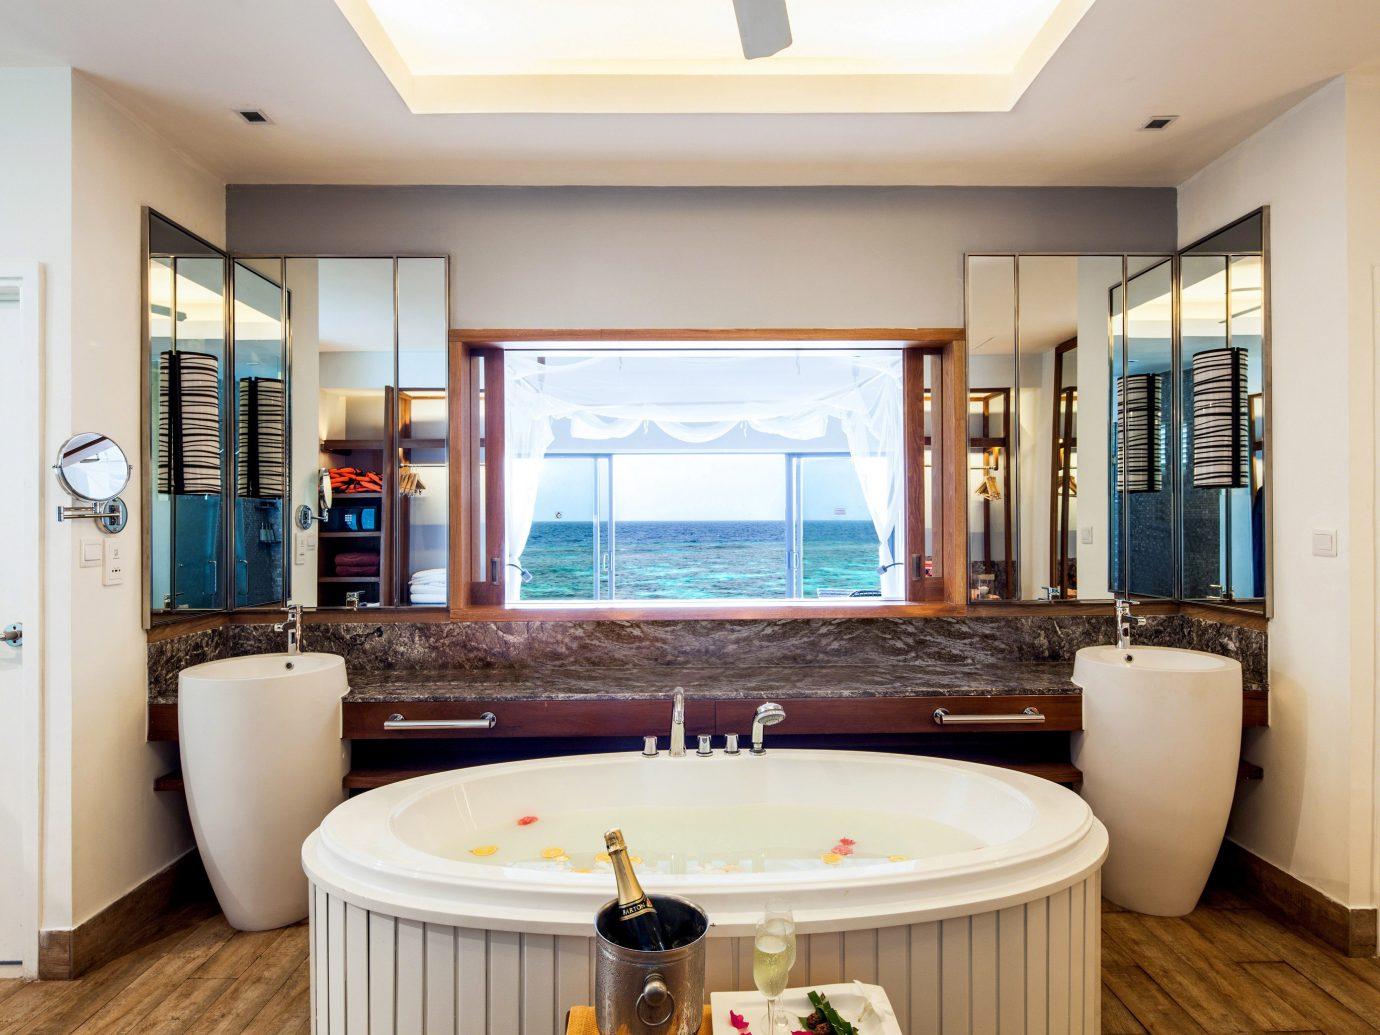 All-Inclusive Resorts Hotels indoor window floor ceiling room bathroom home interior design real estate estate Suite living room furniture